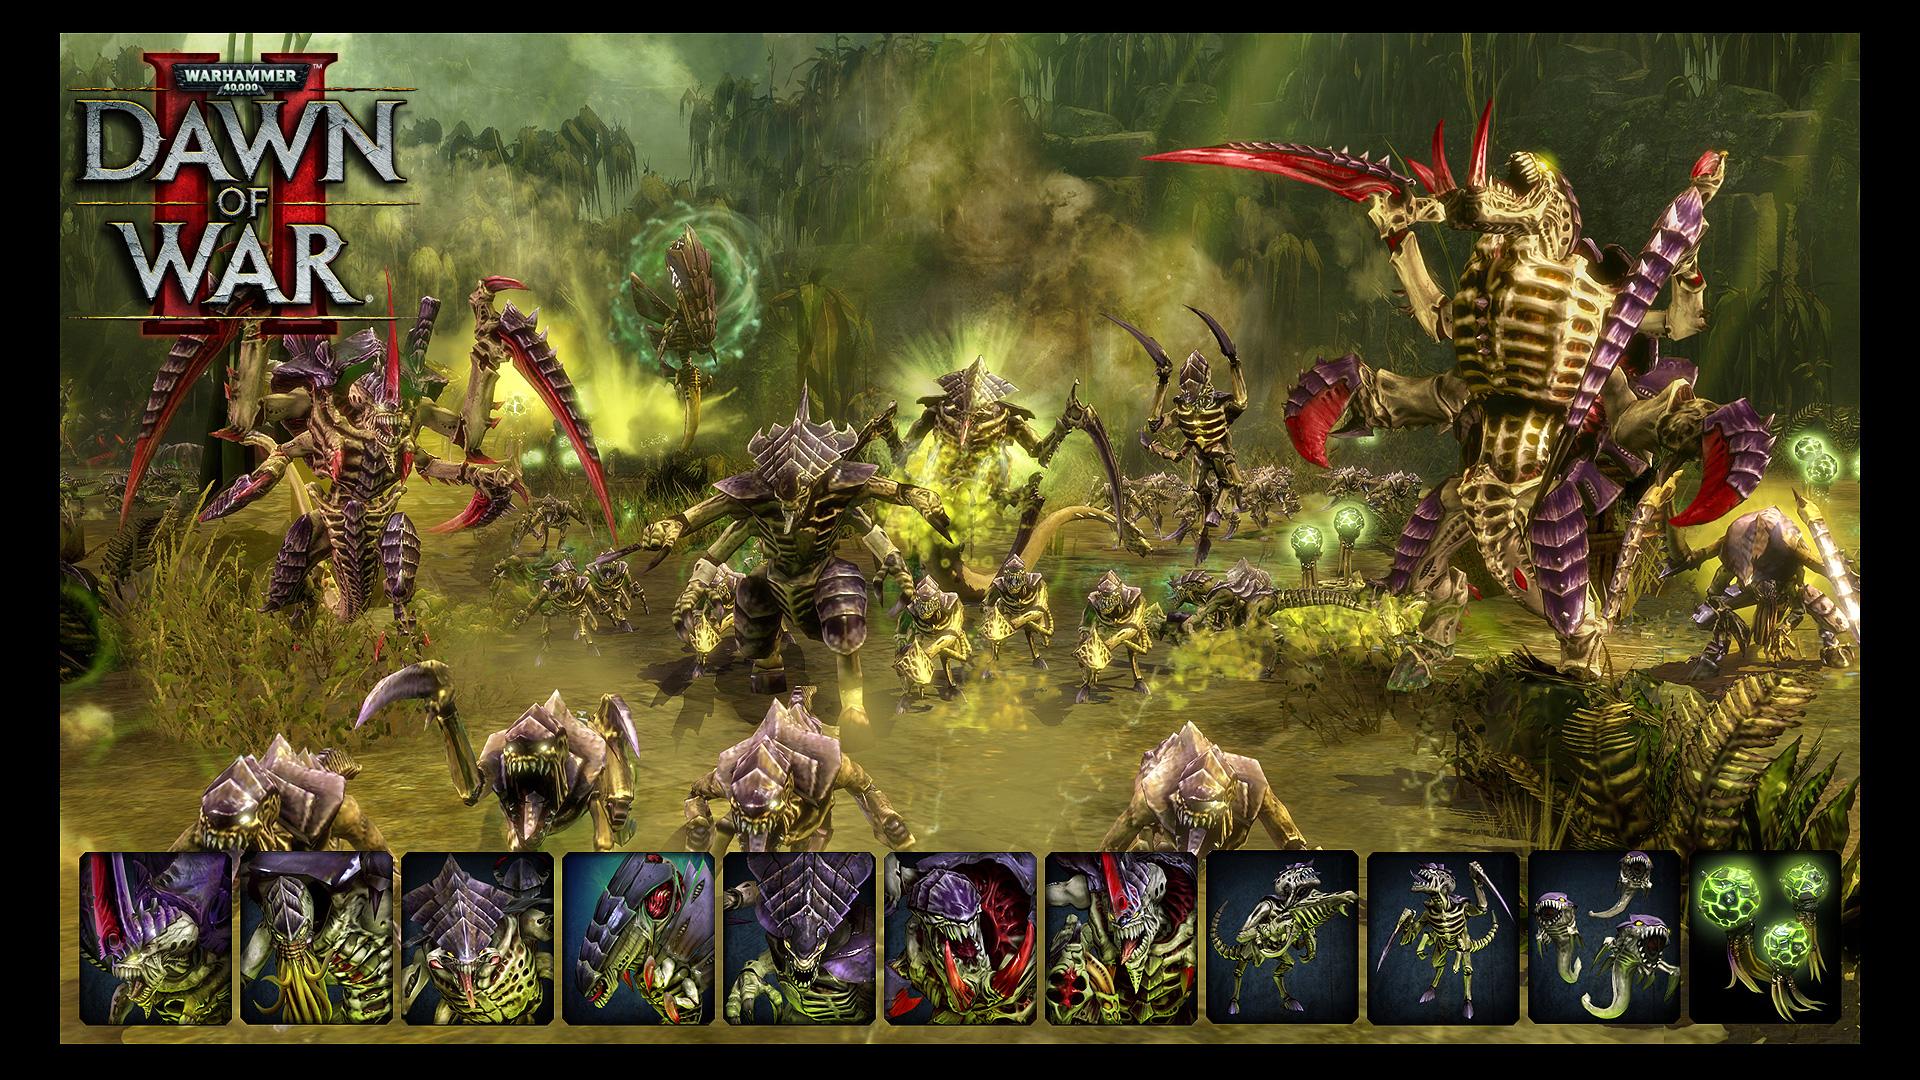 Free Warhammer 40000: Dawn of War II Wallpaper in 1920x1080